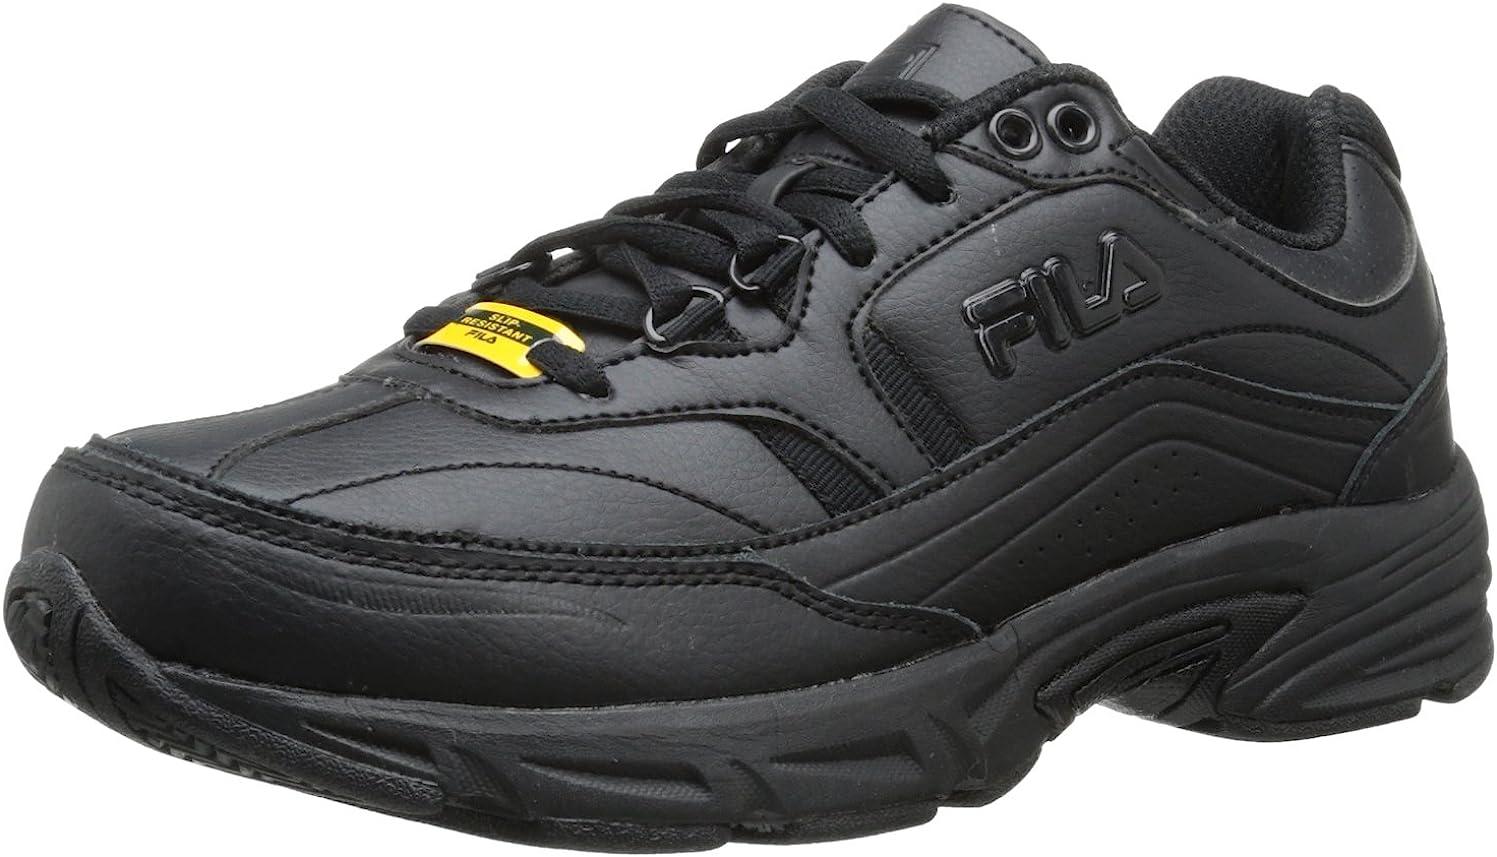 Fila Women's Memory Workshift Training Shoe,Black/Black/Black,9.